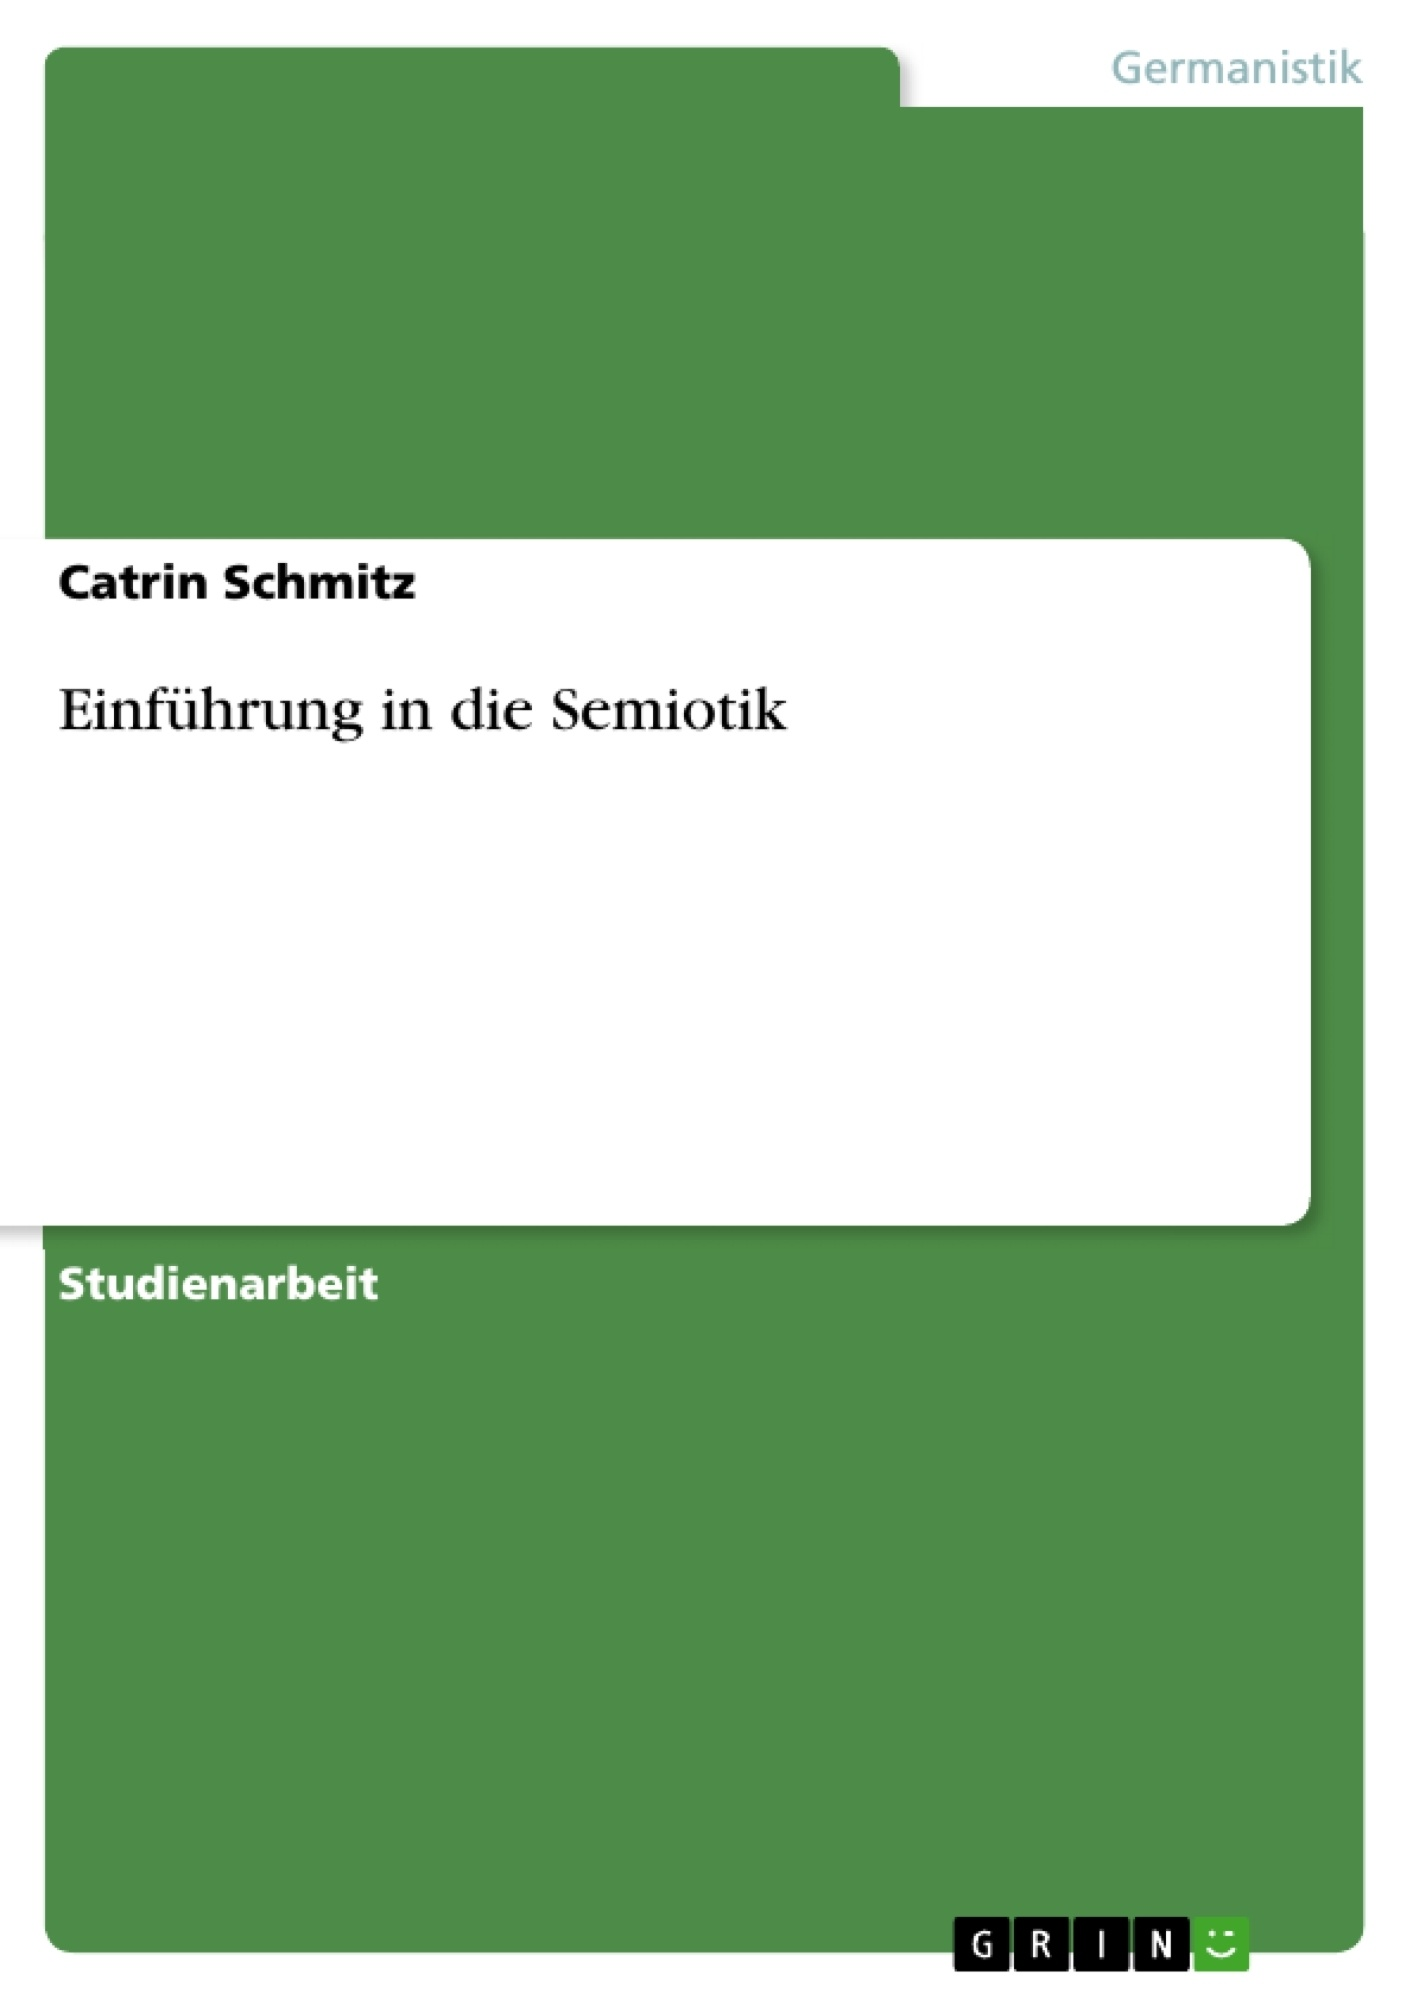 Titel: Einführung in die Semiotik